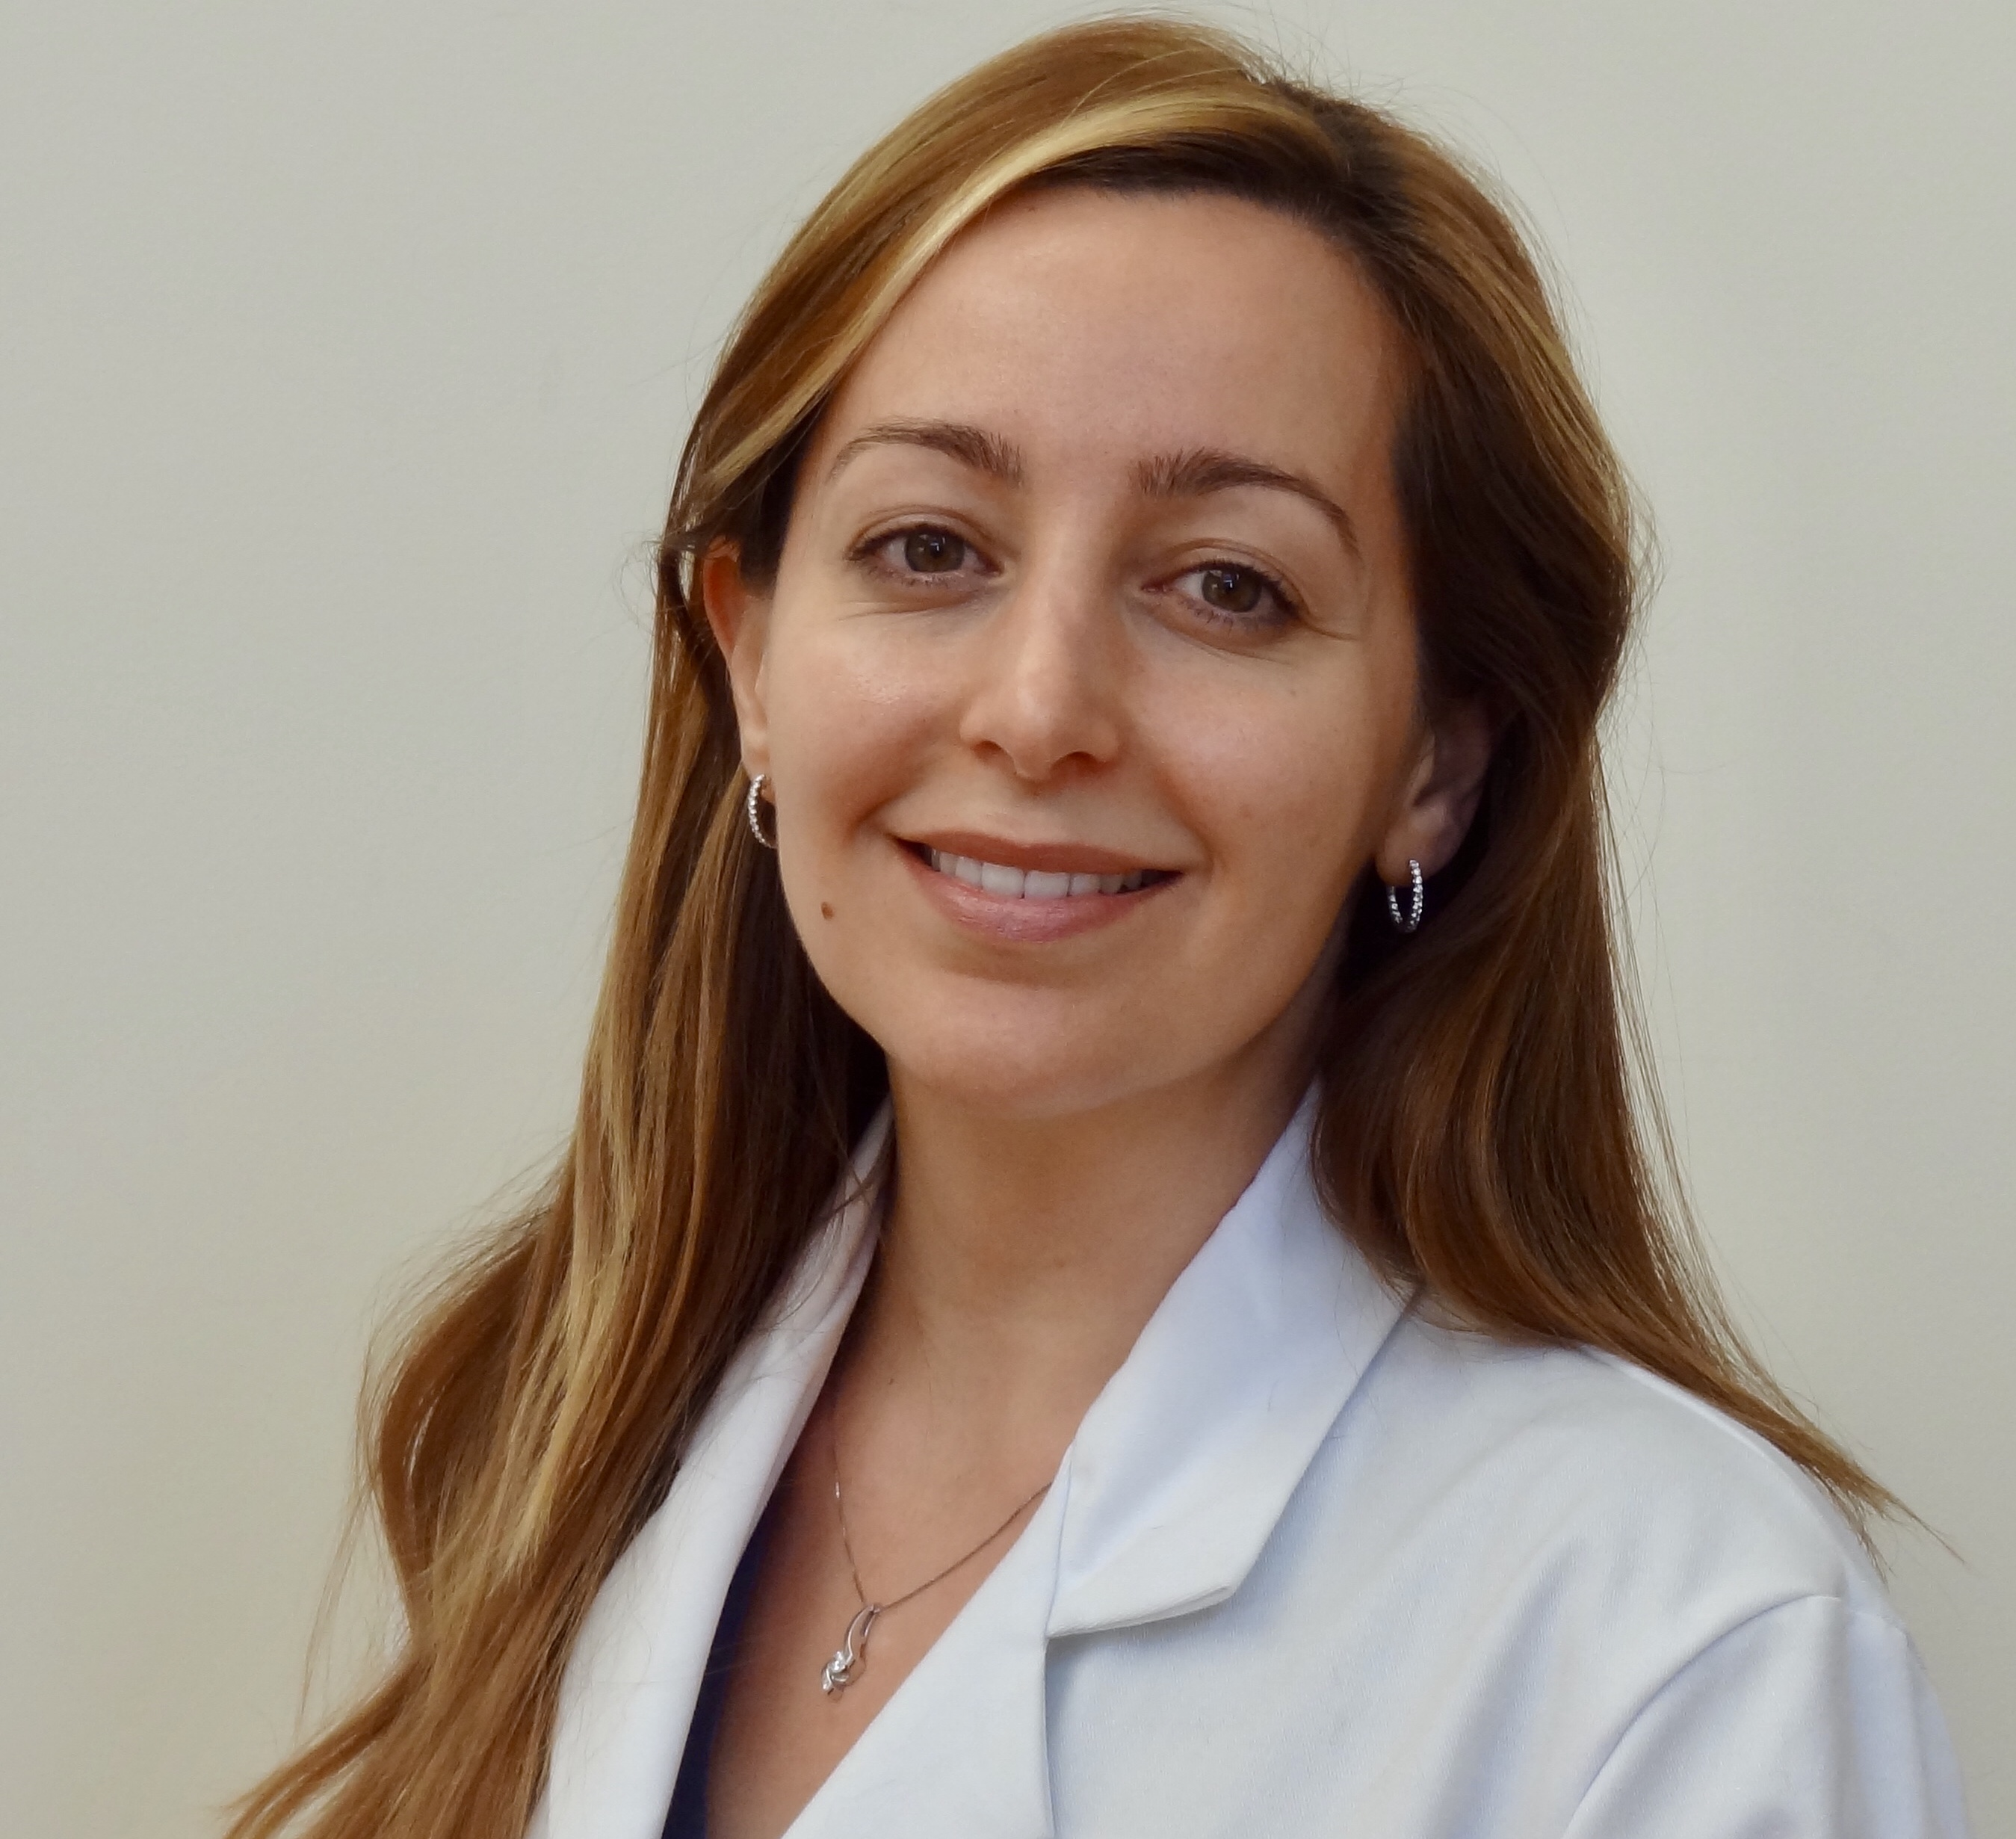 Dr. Verga smiling in a white lab coat.